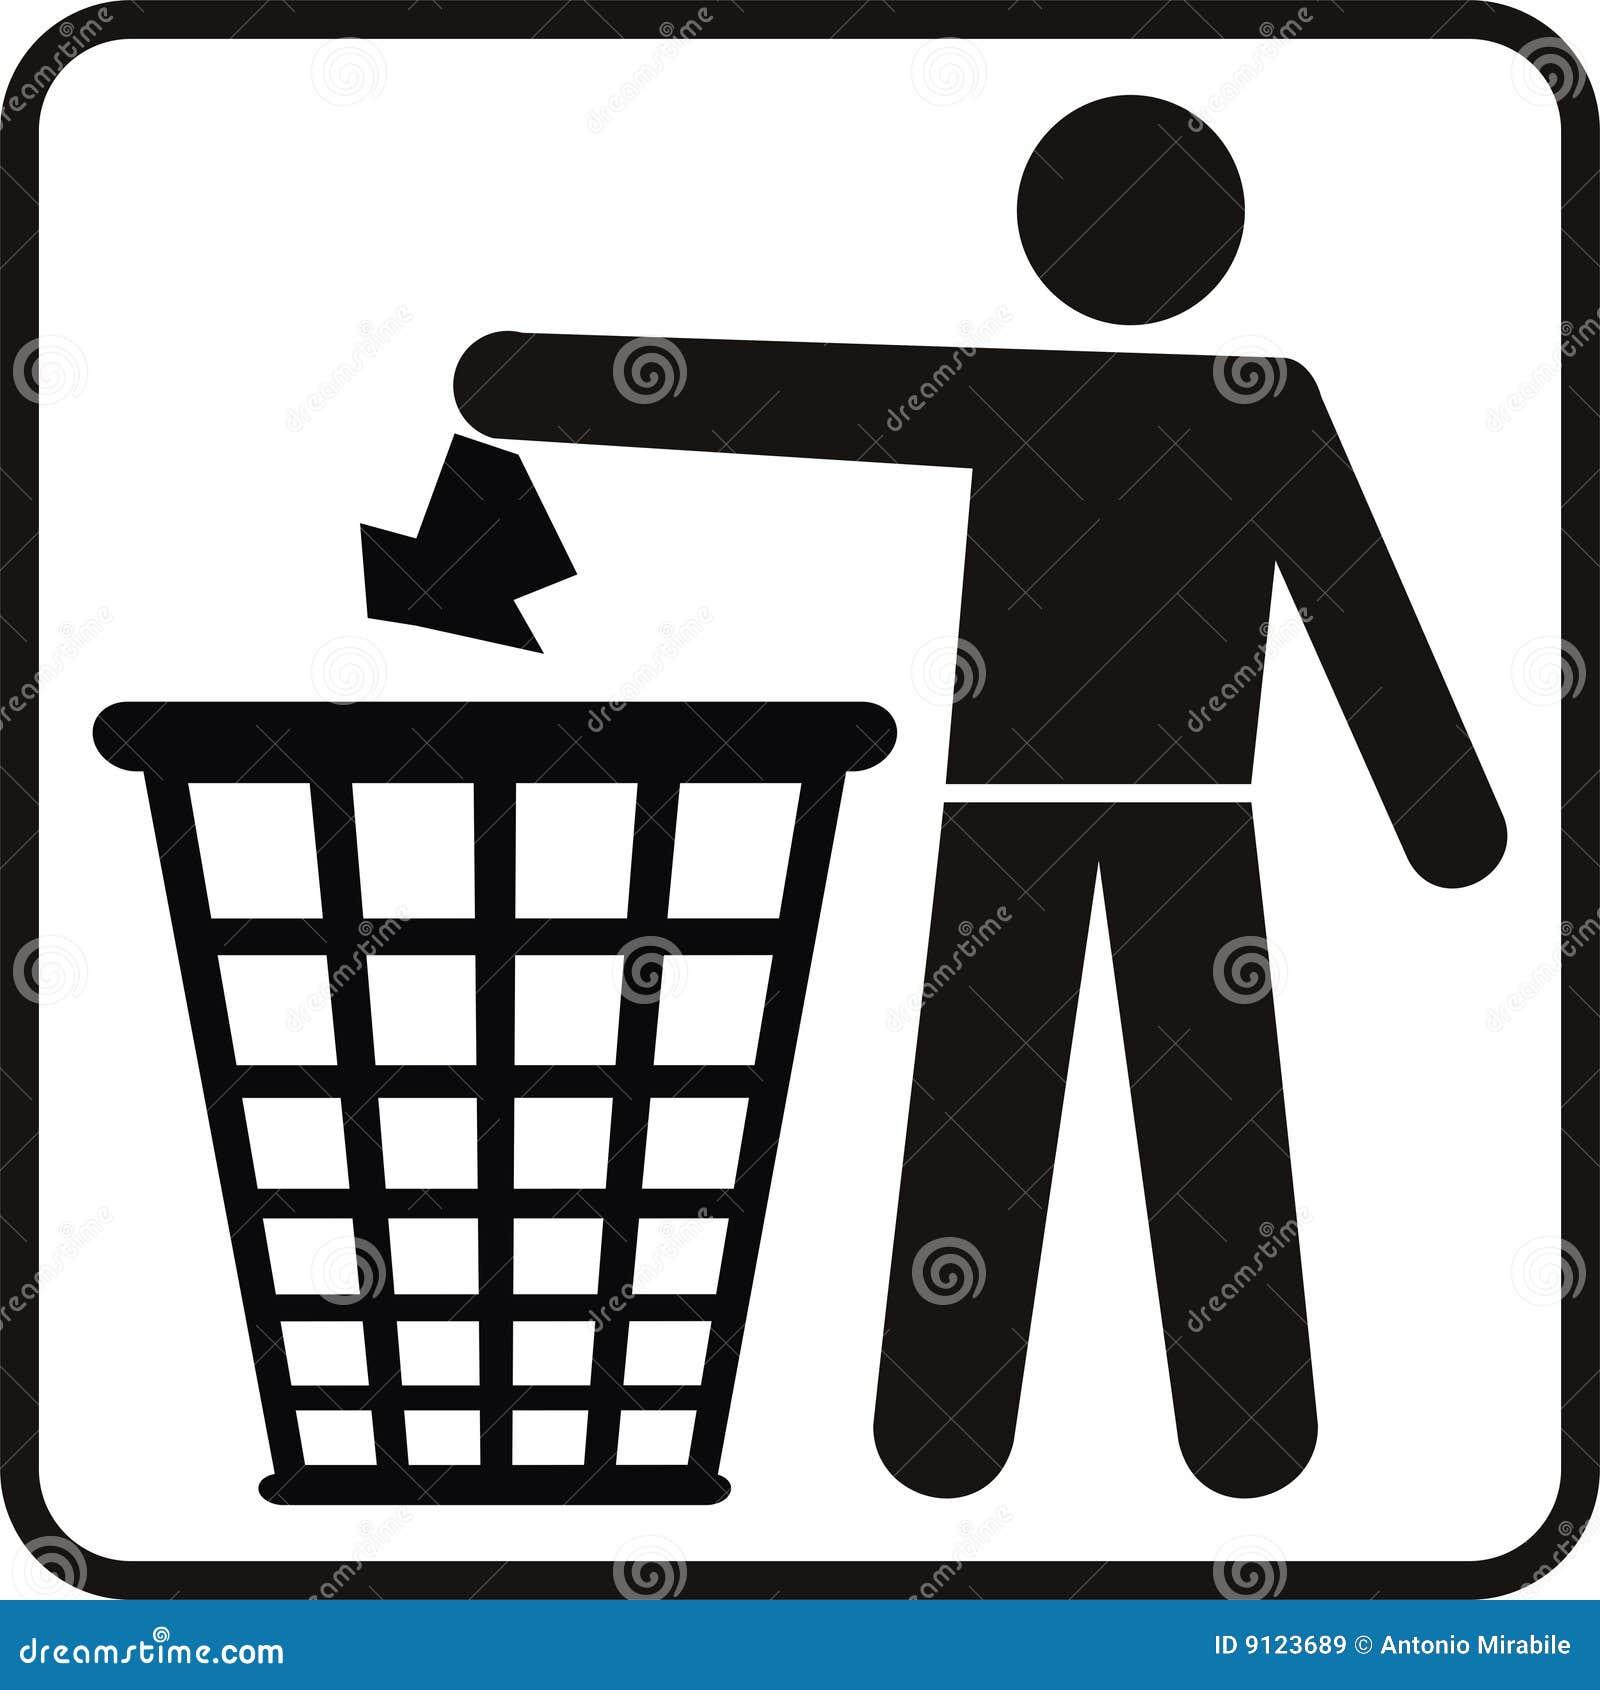 Trash Basket Royalty Free Stock Images Image 9123689